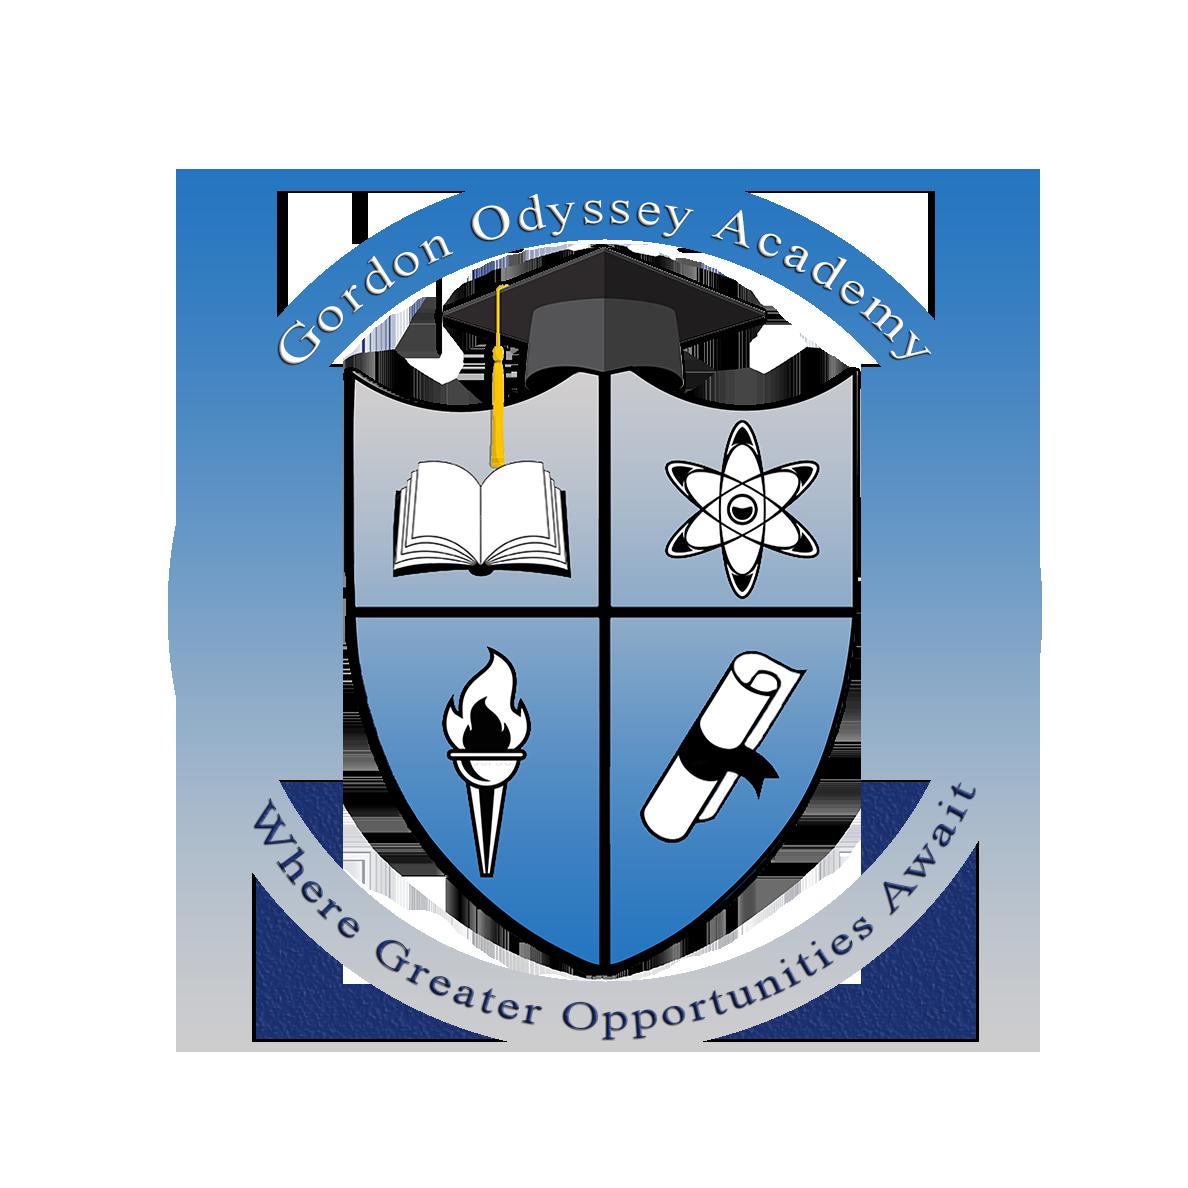 Gordon Odyssey Academy